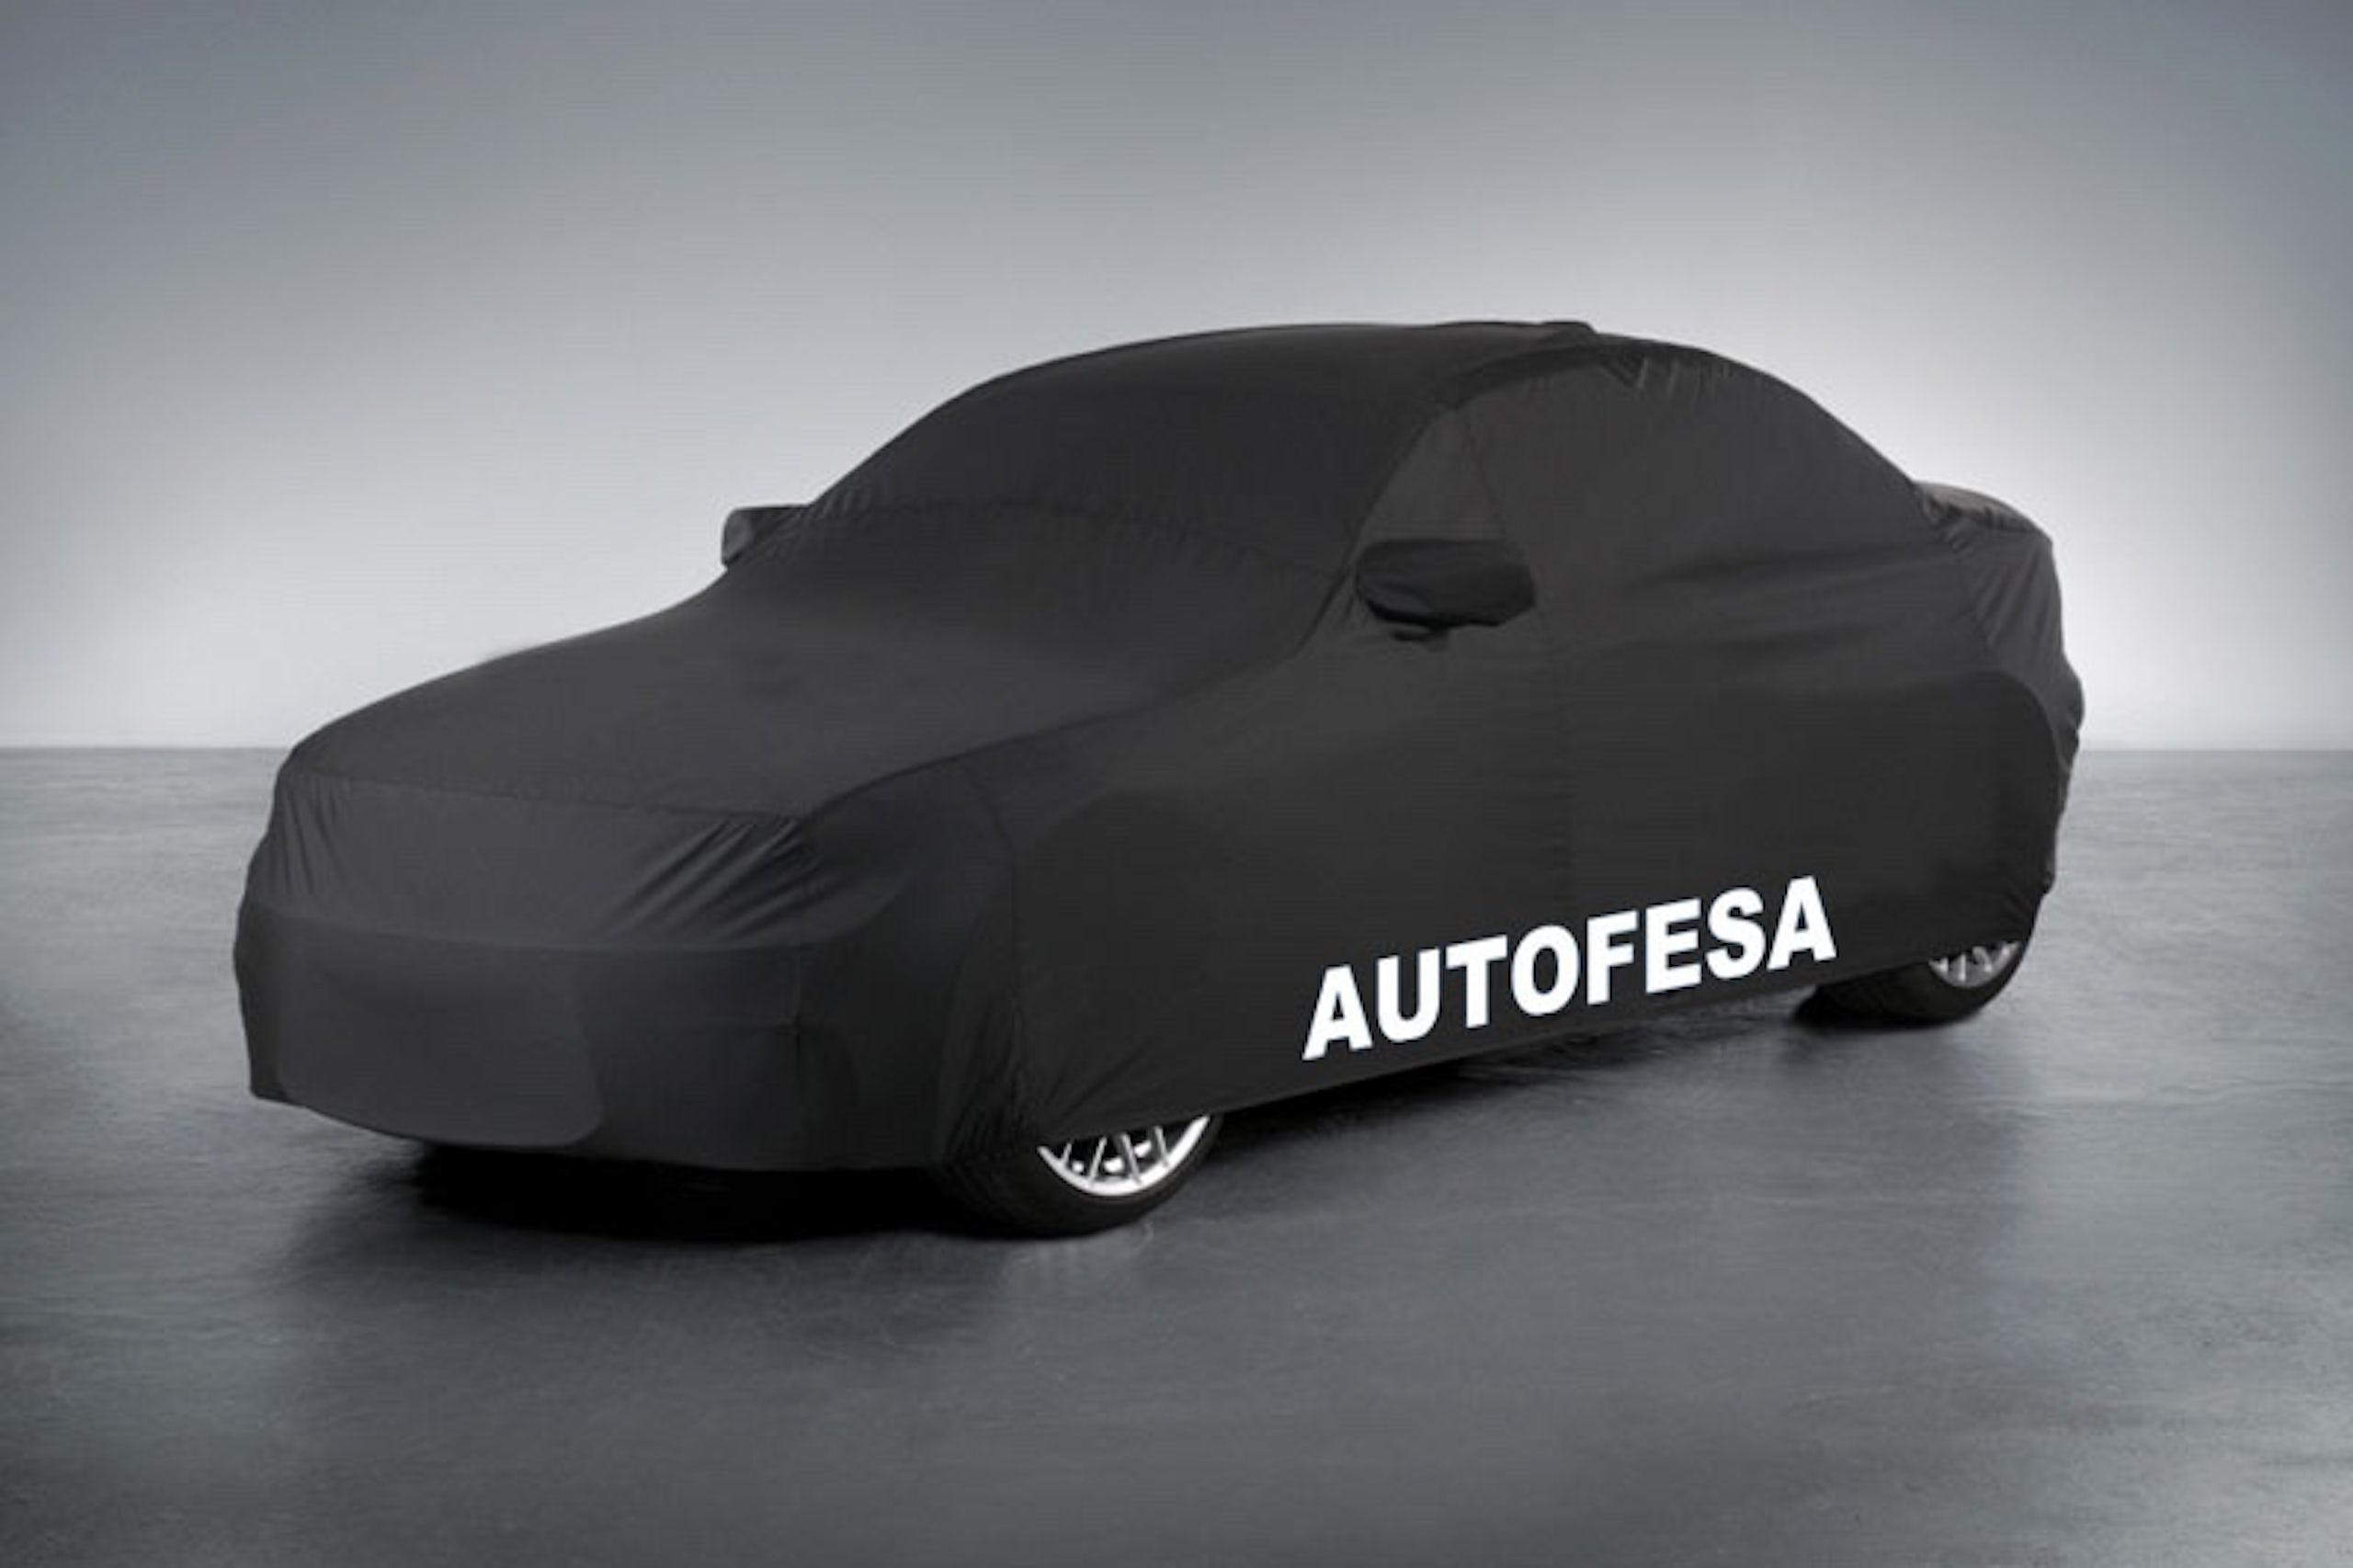 Peugeot Rcz 2.0 HDi 163cv Asphalt 2p FAP - Foto 31